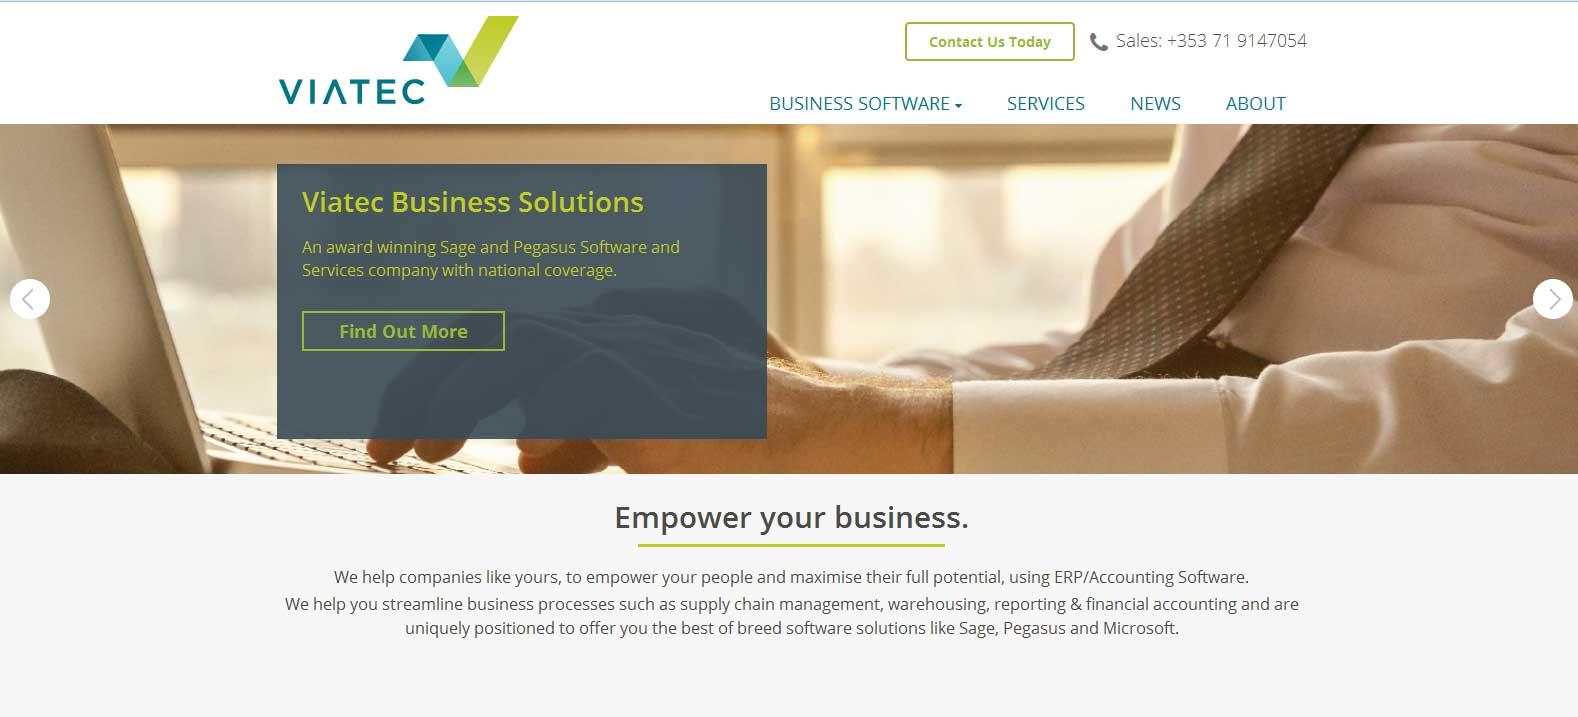 Viatec Business Solutions